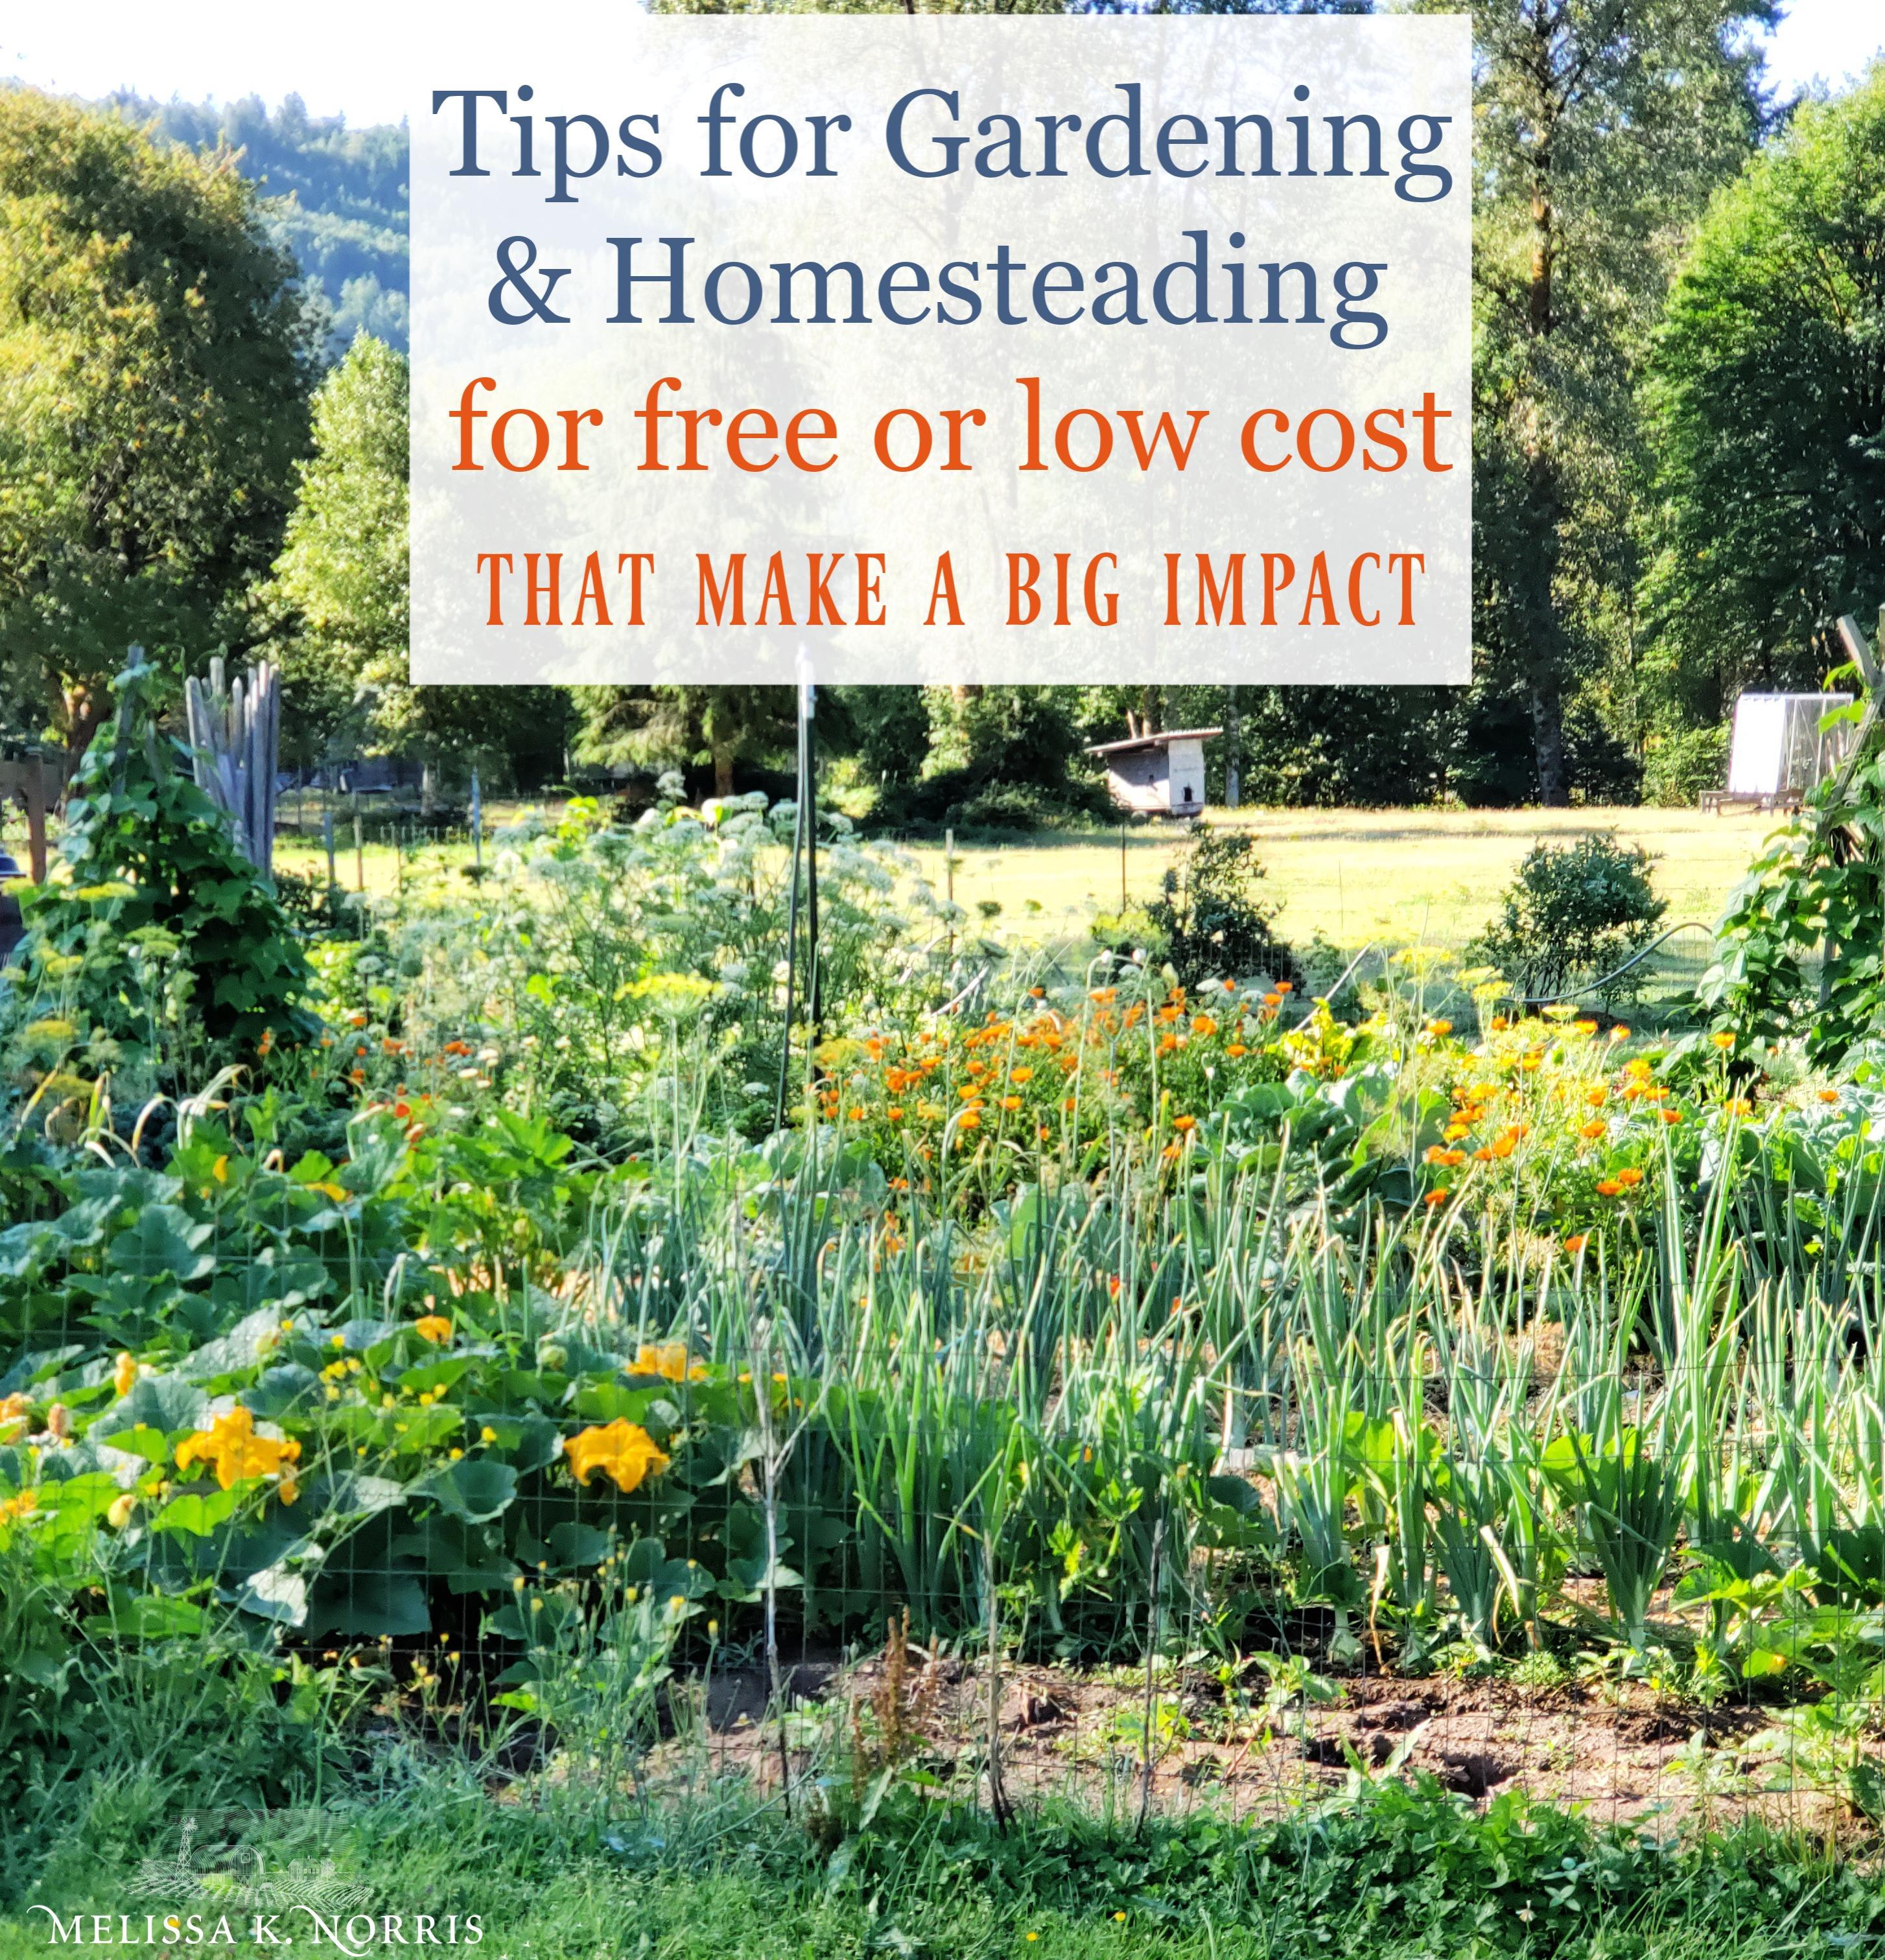 Cheap Gardening Ideas: Cheap Garden Ideas For Your Homestead That Make A Big Impact